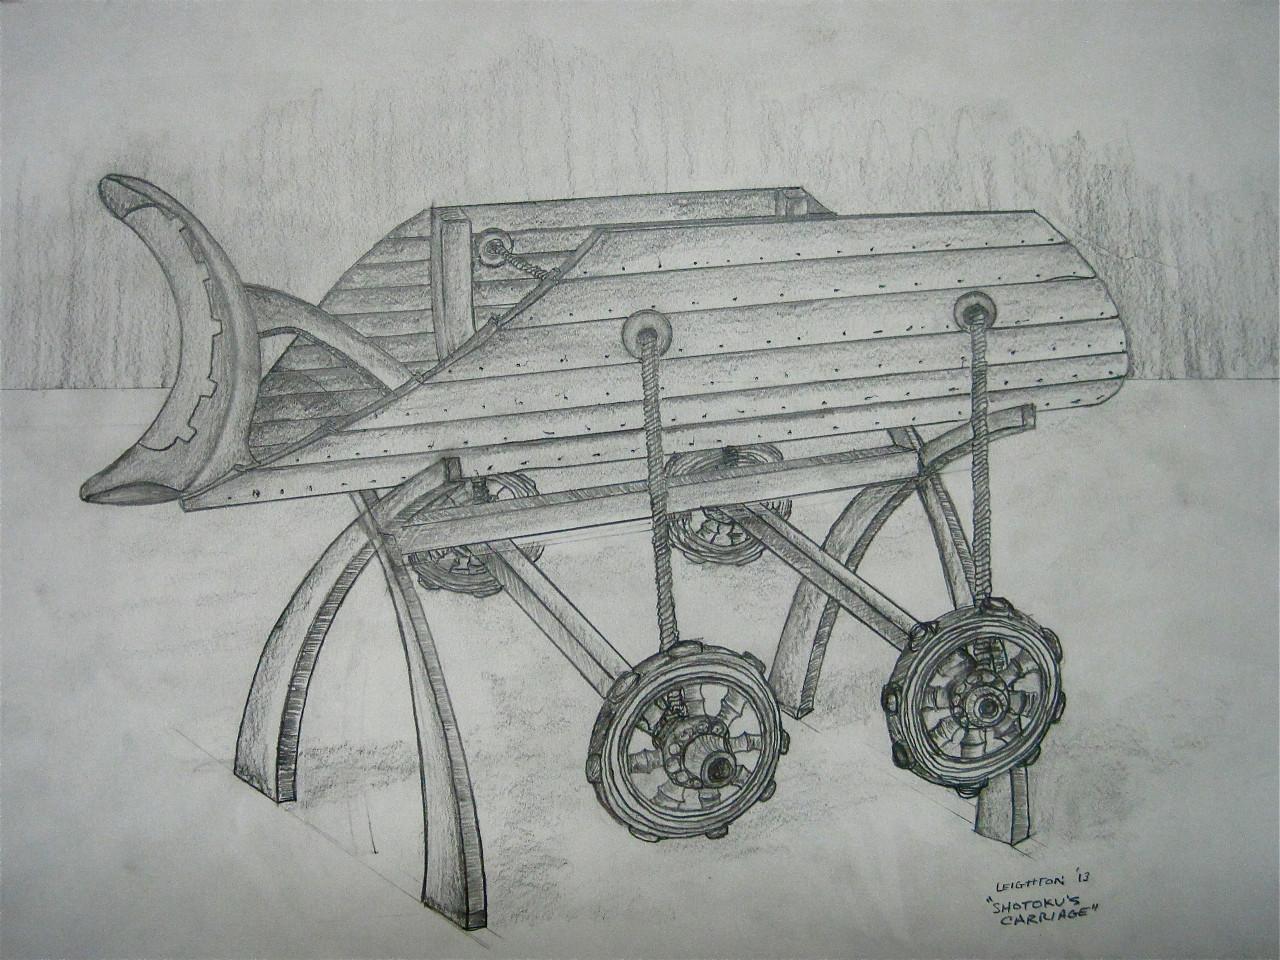 Shotoku's Carriage image 6